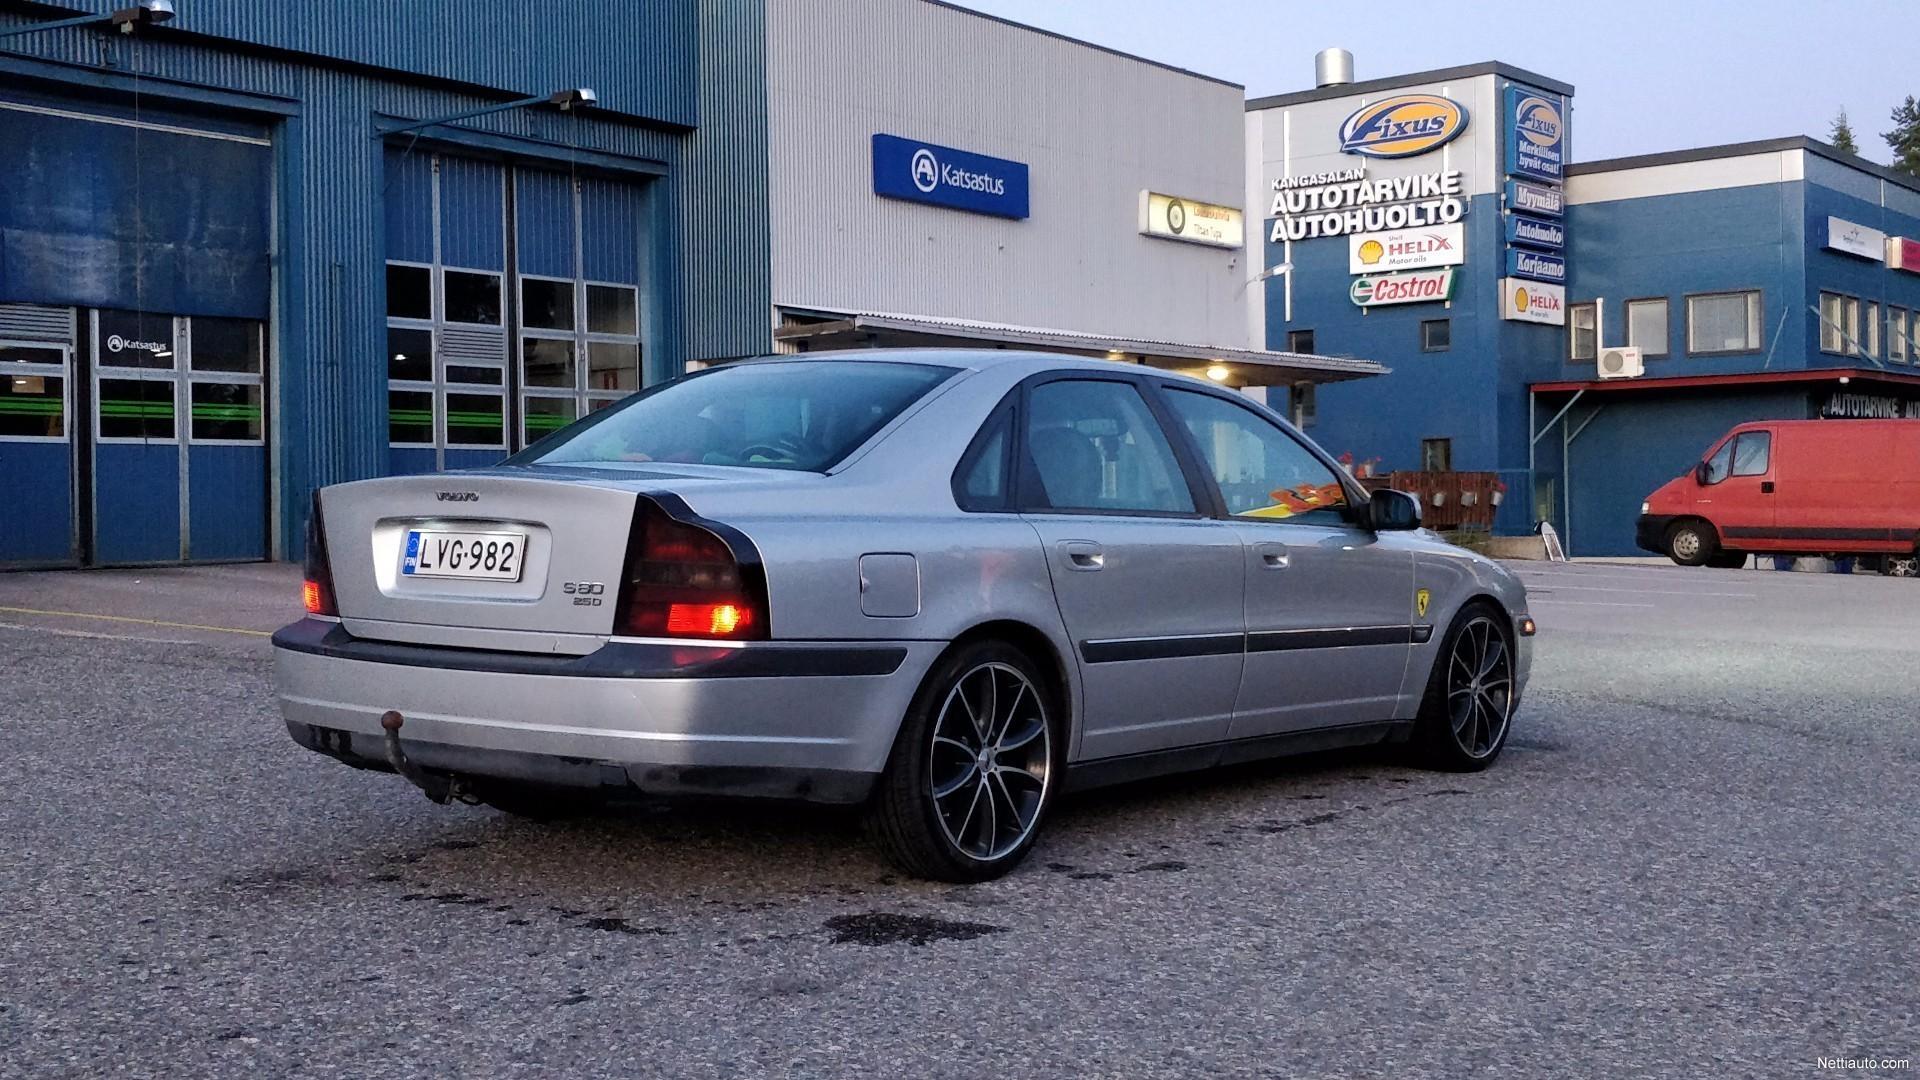 Volvo s80 2 5d 4d a sedan 1999 used vehicle nettiauto for 1999 volvo s80 window regulator